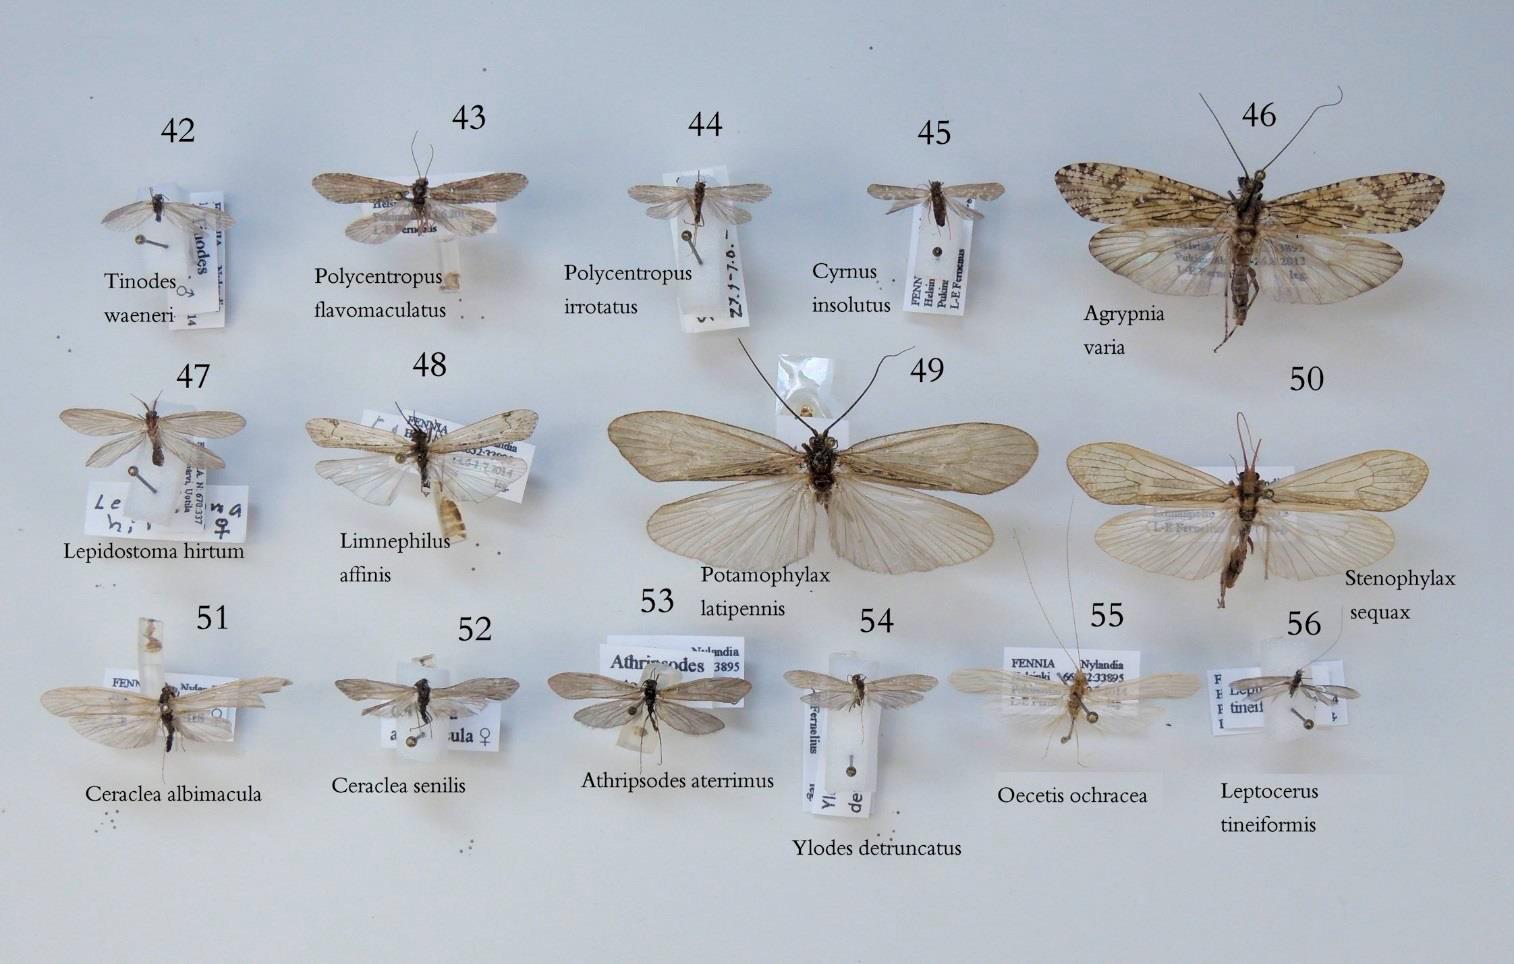 longinoja-vesiperhonen-lars-erik-farnelius3